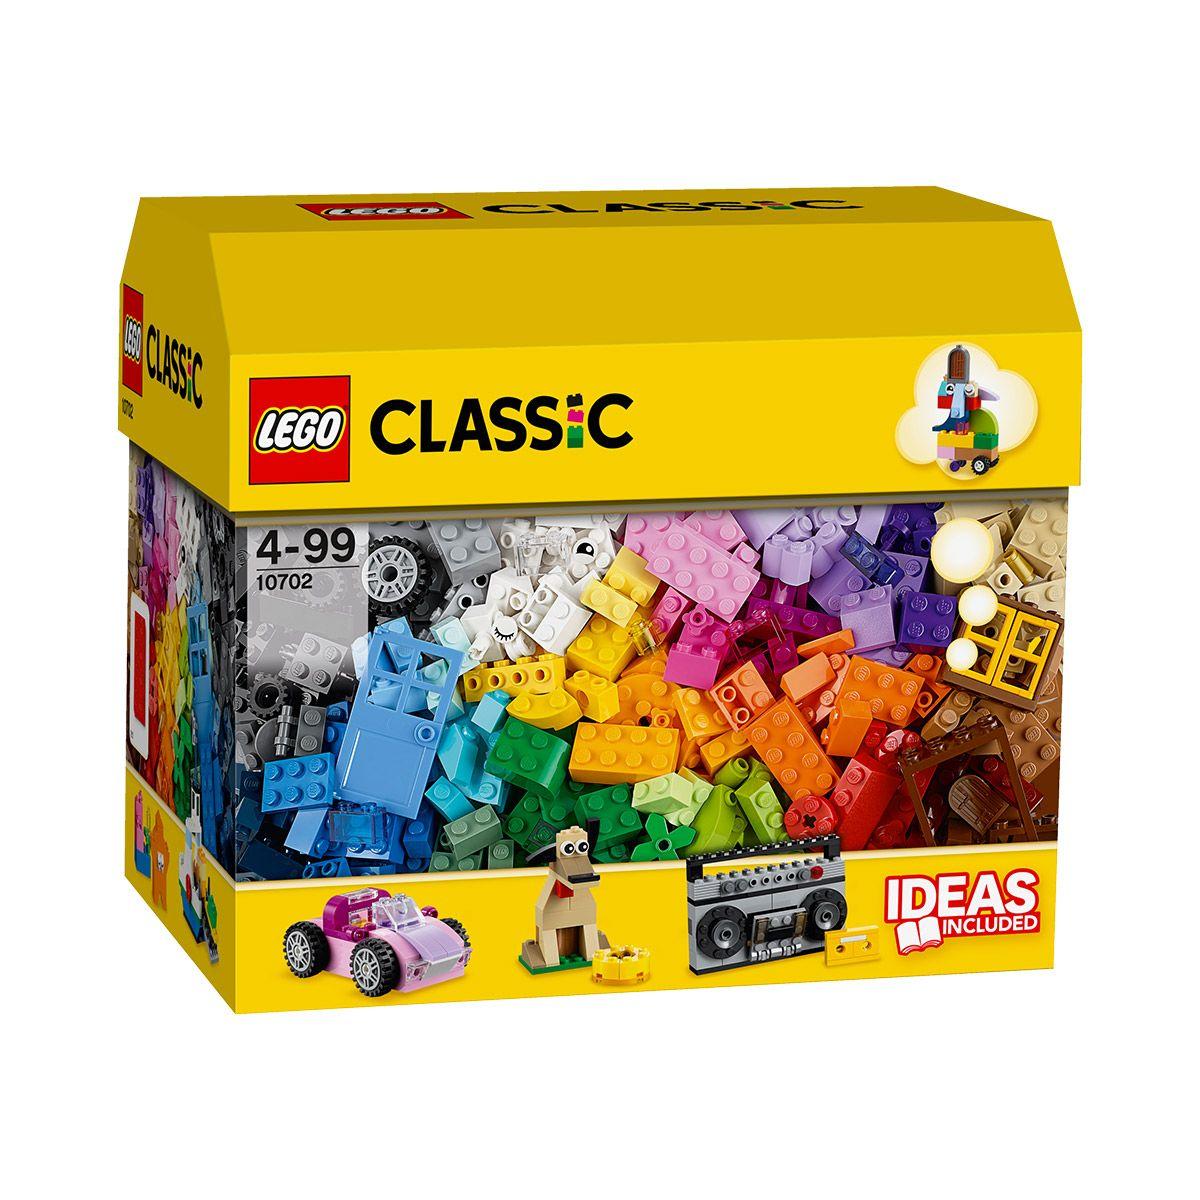 Créatives Lego Classic Set Coffrets De 10702 Constructions Nnwvm80